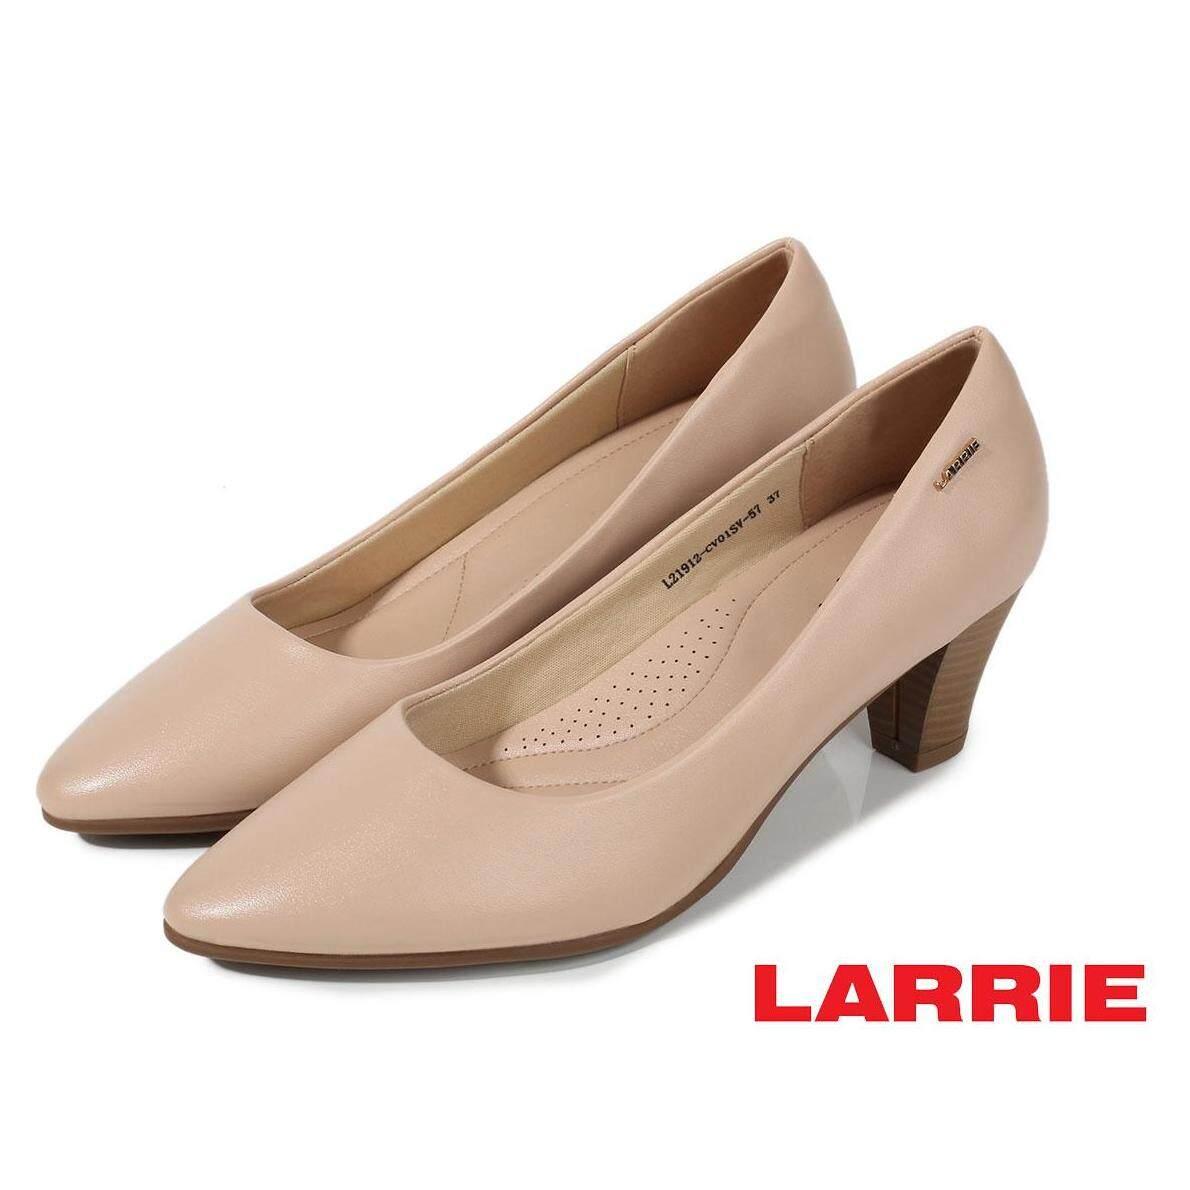 LARRIE Kasut Wanita Elegance Comfortable Basic Heels - L21912-CV01SV